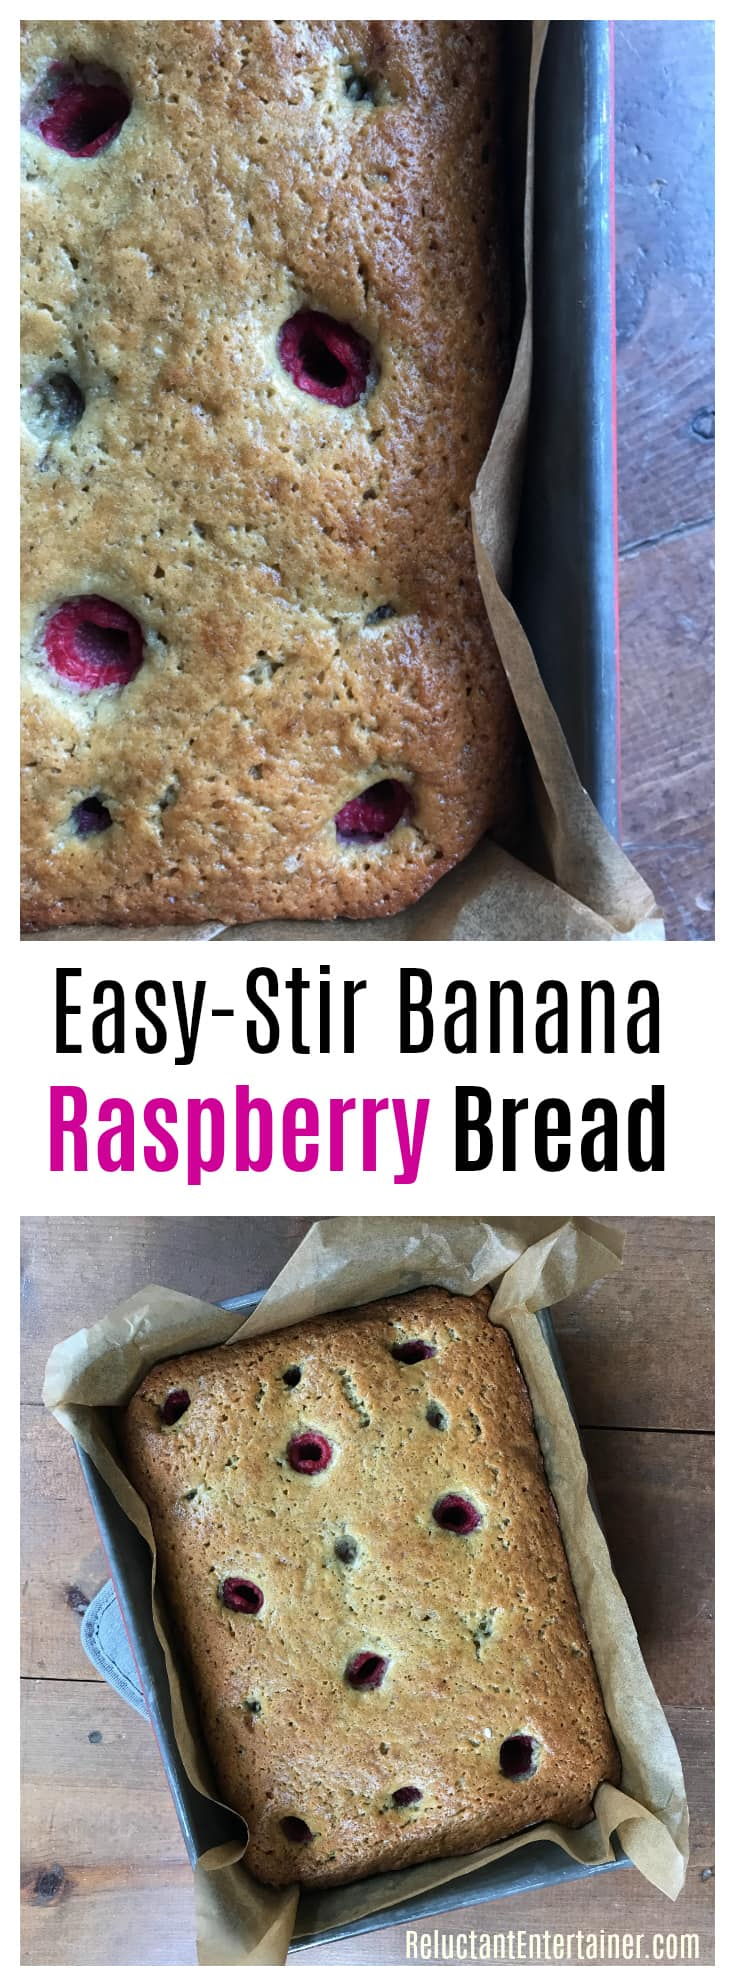 Easy-Stir Banana Raspberry Bread Recipe